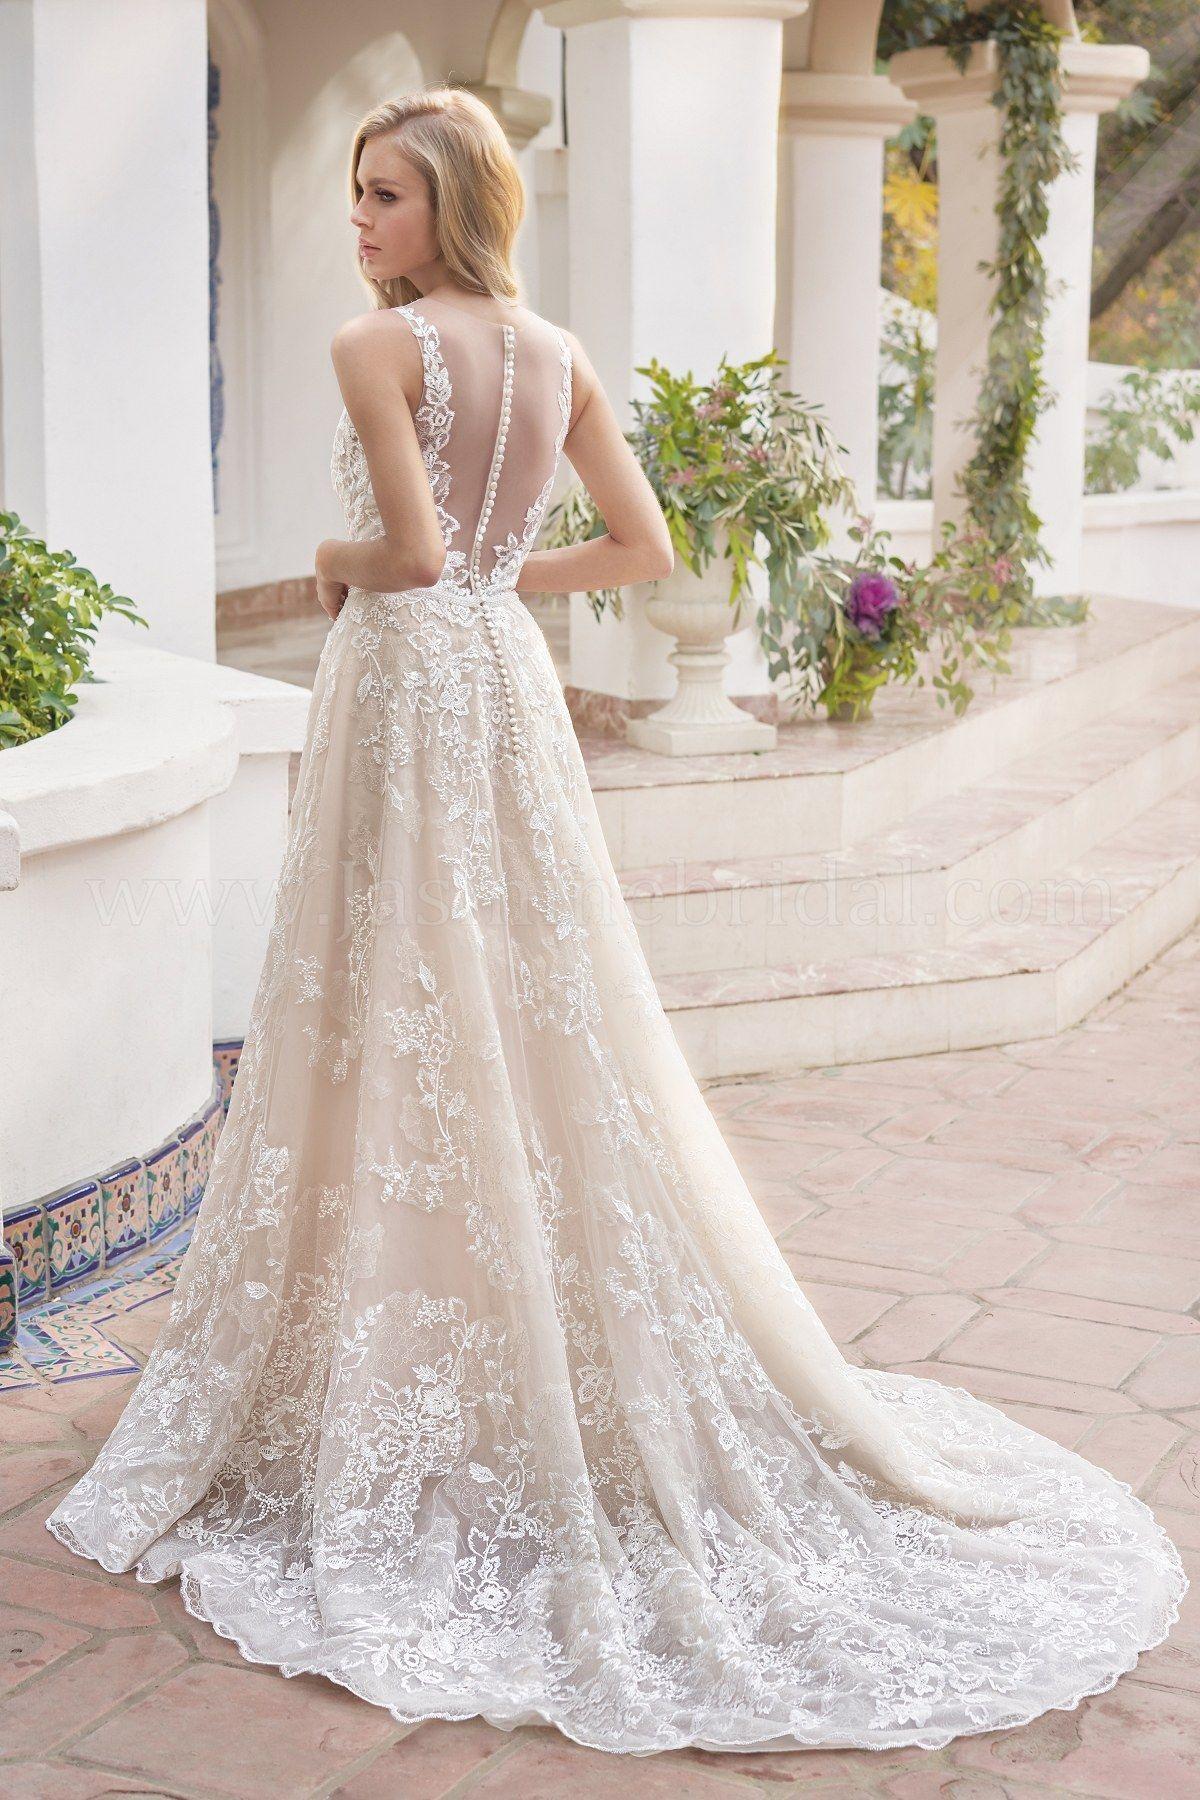 T202064 Illusion Bodice Illusion Neckline Embroidered Lace Tulle Organza Weddi Wedding Dress Tulle Lace Wedding Dresses Taffeta Tulle Wedding Dress Mermaid